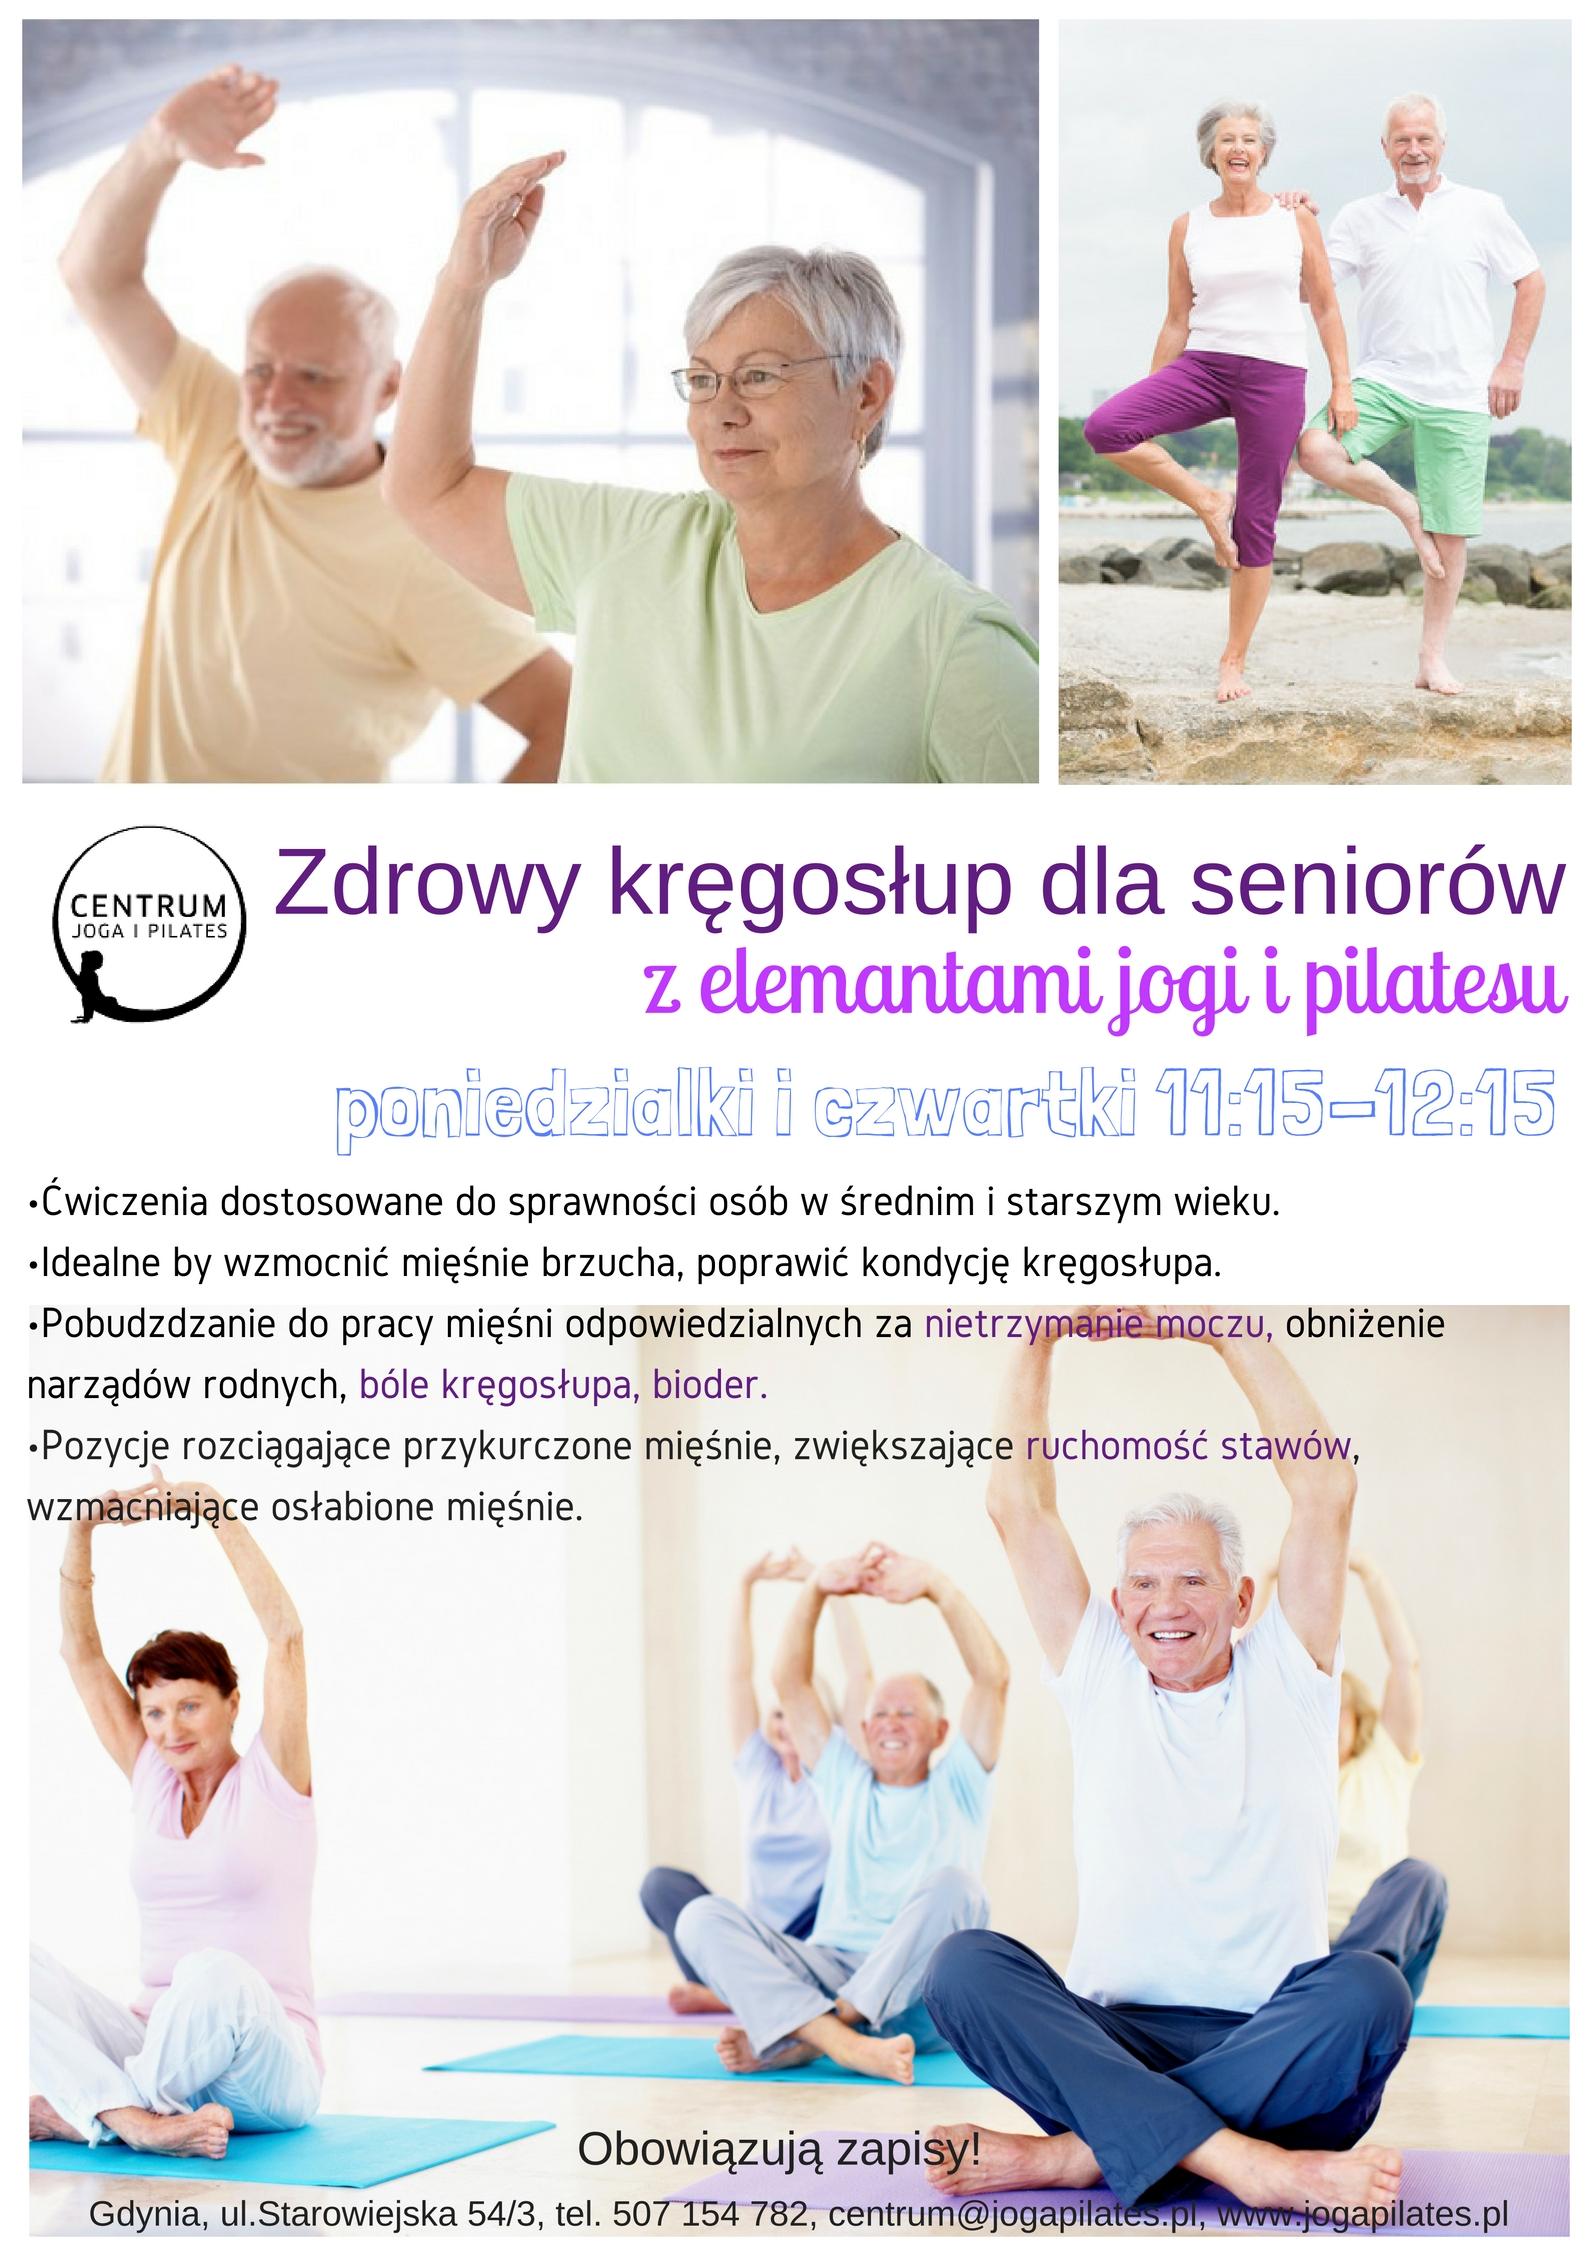 JOGA i PILATES dla seniorow 3 (2)